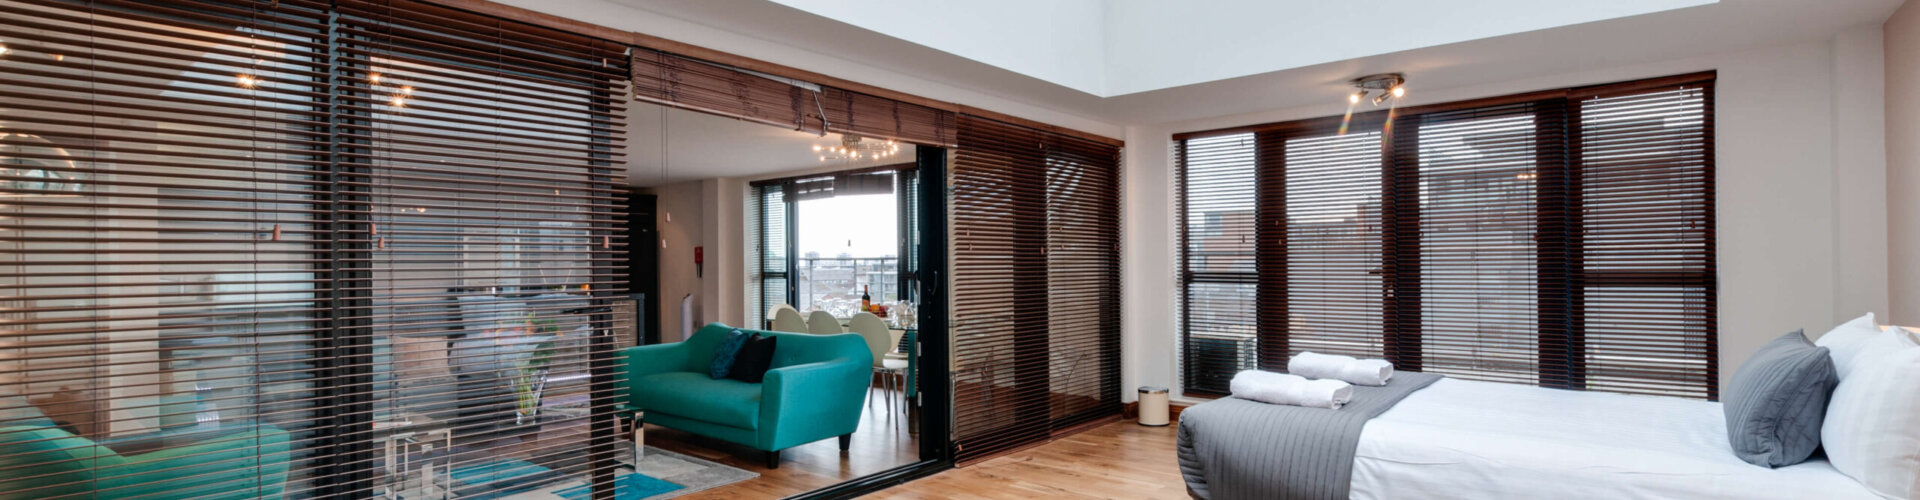 Bedroom Duke Street Apartment Liverpool